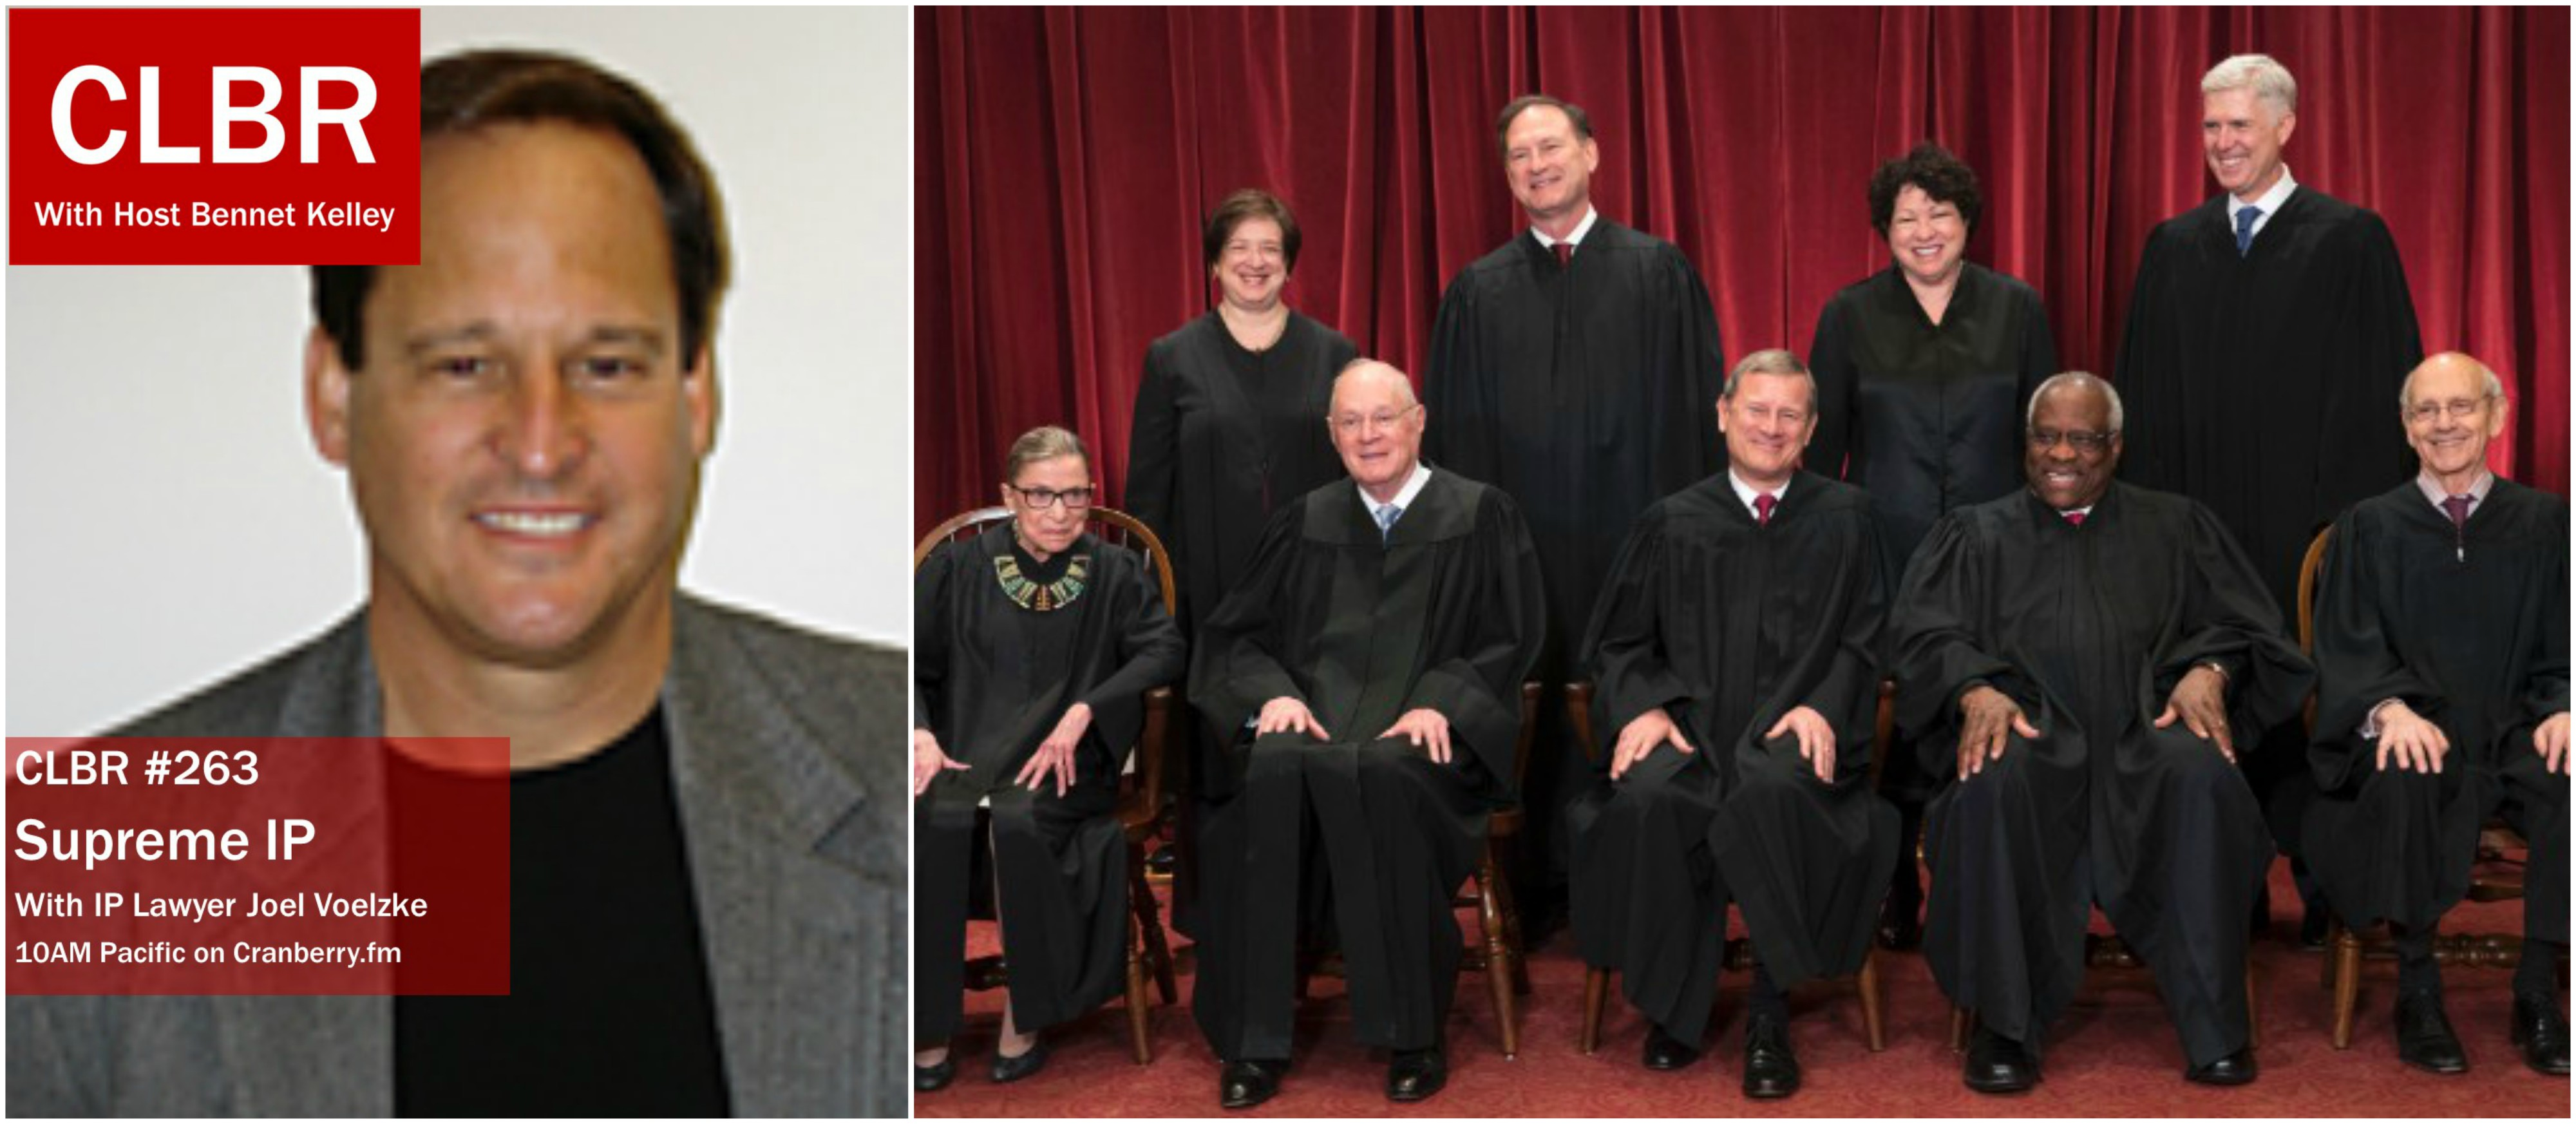 CLBR #263: Joel Voelzke on Supreme Court IP Cases